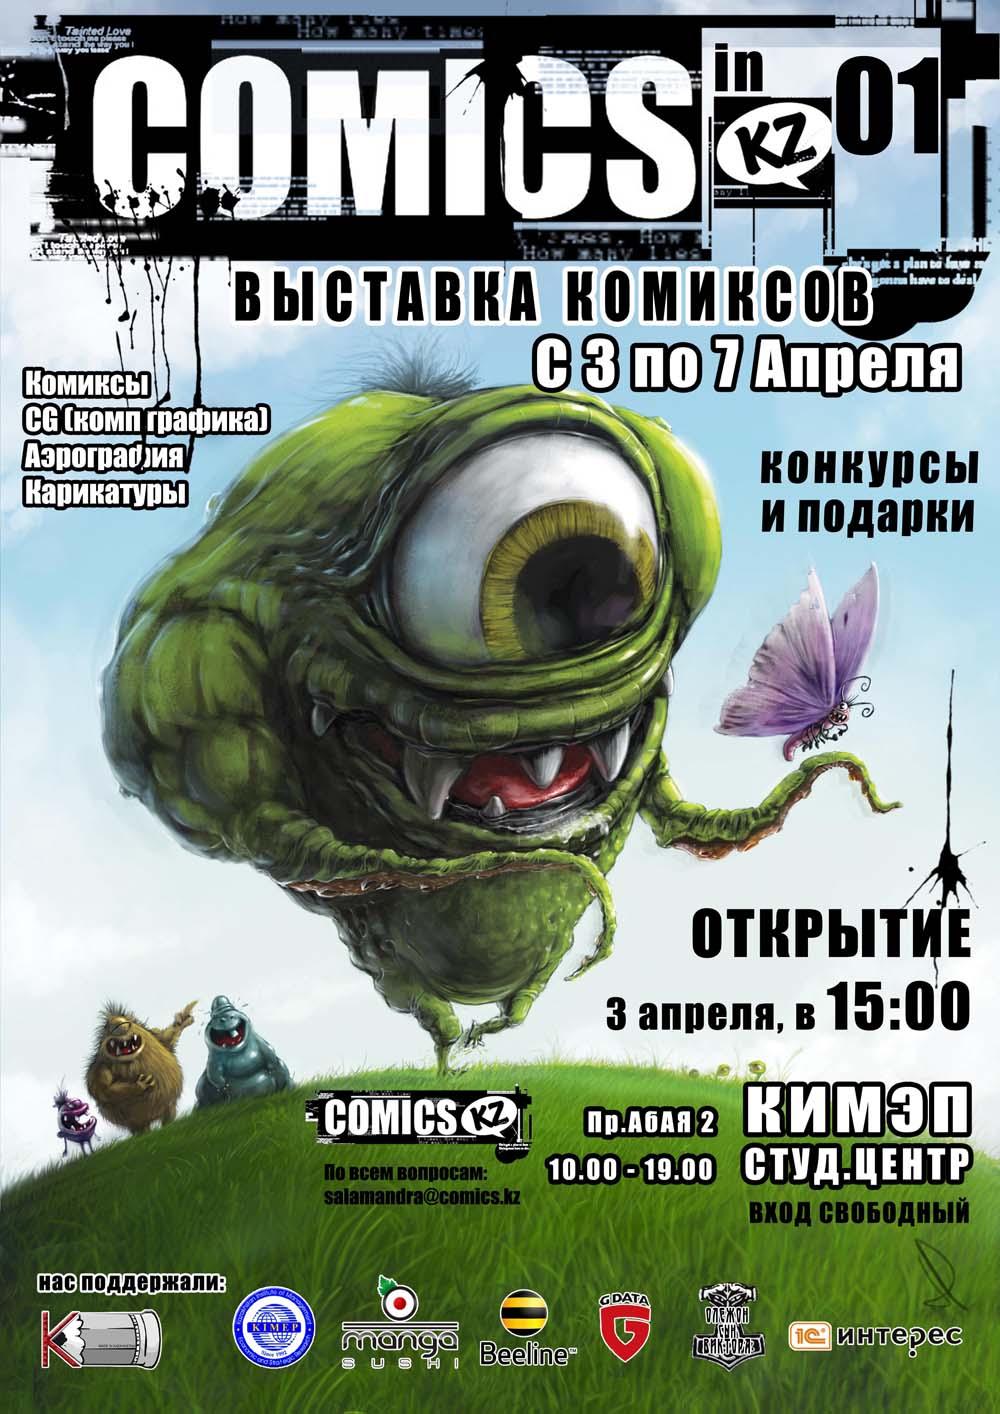 Comics.kz